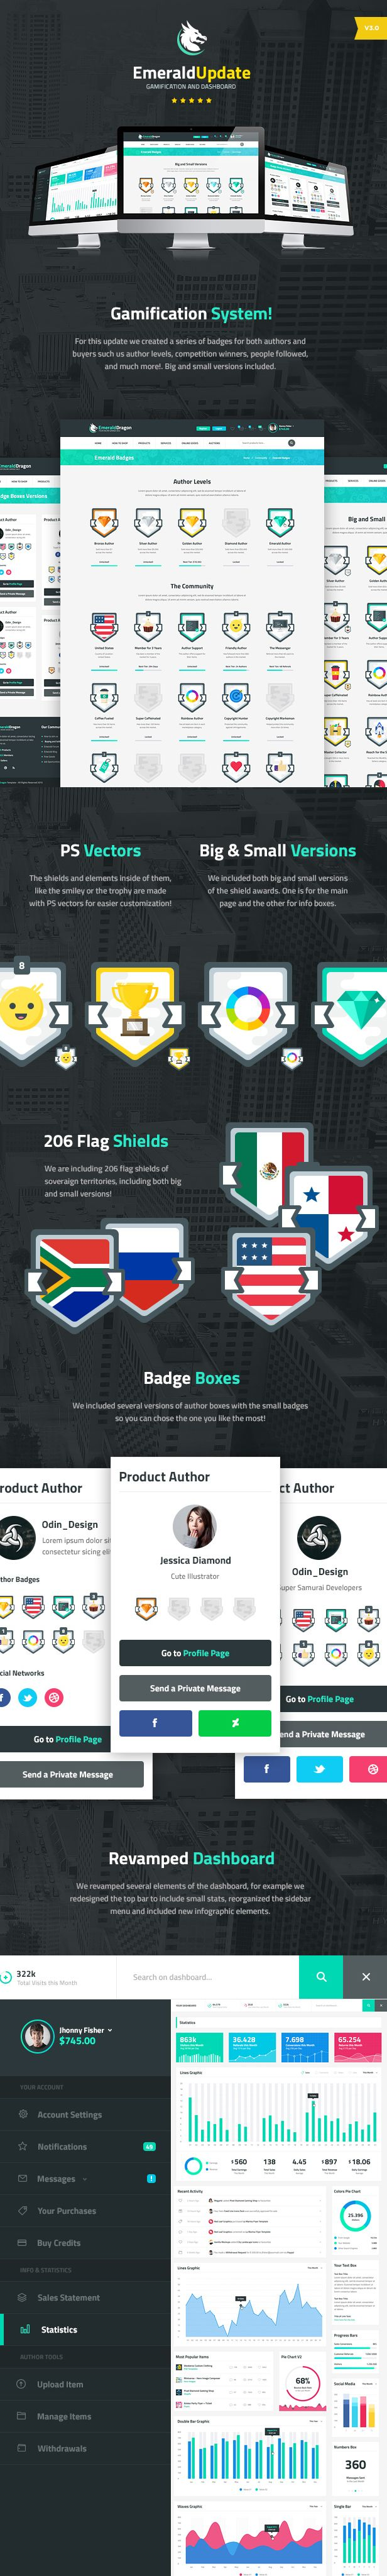 Emerald Dragon - PSD Multipurpose Marketplace - 9